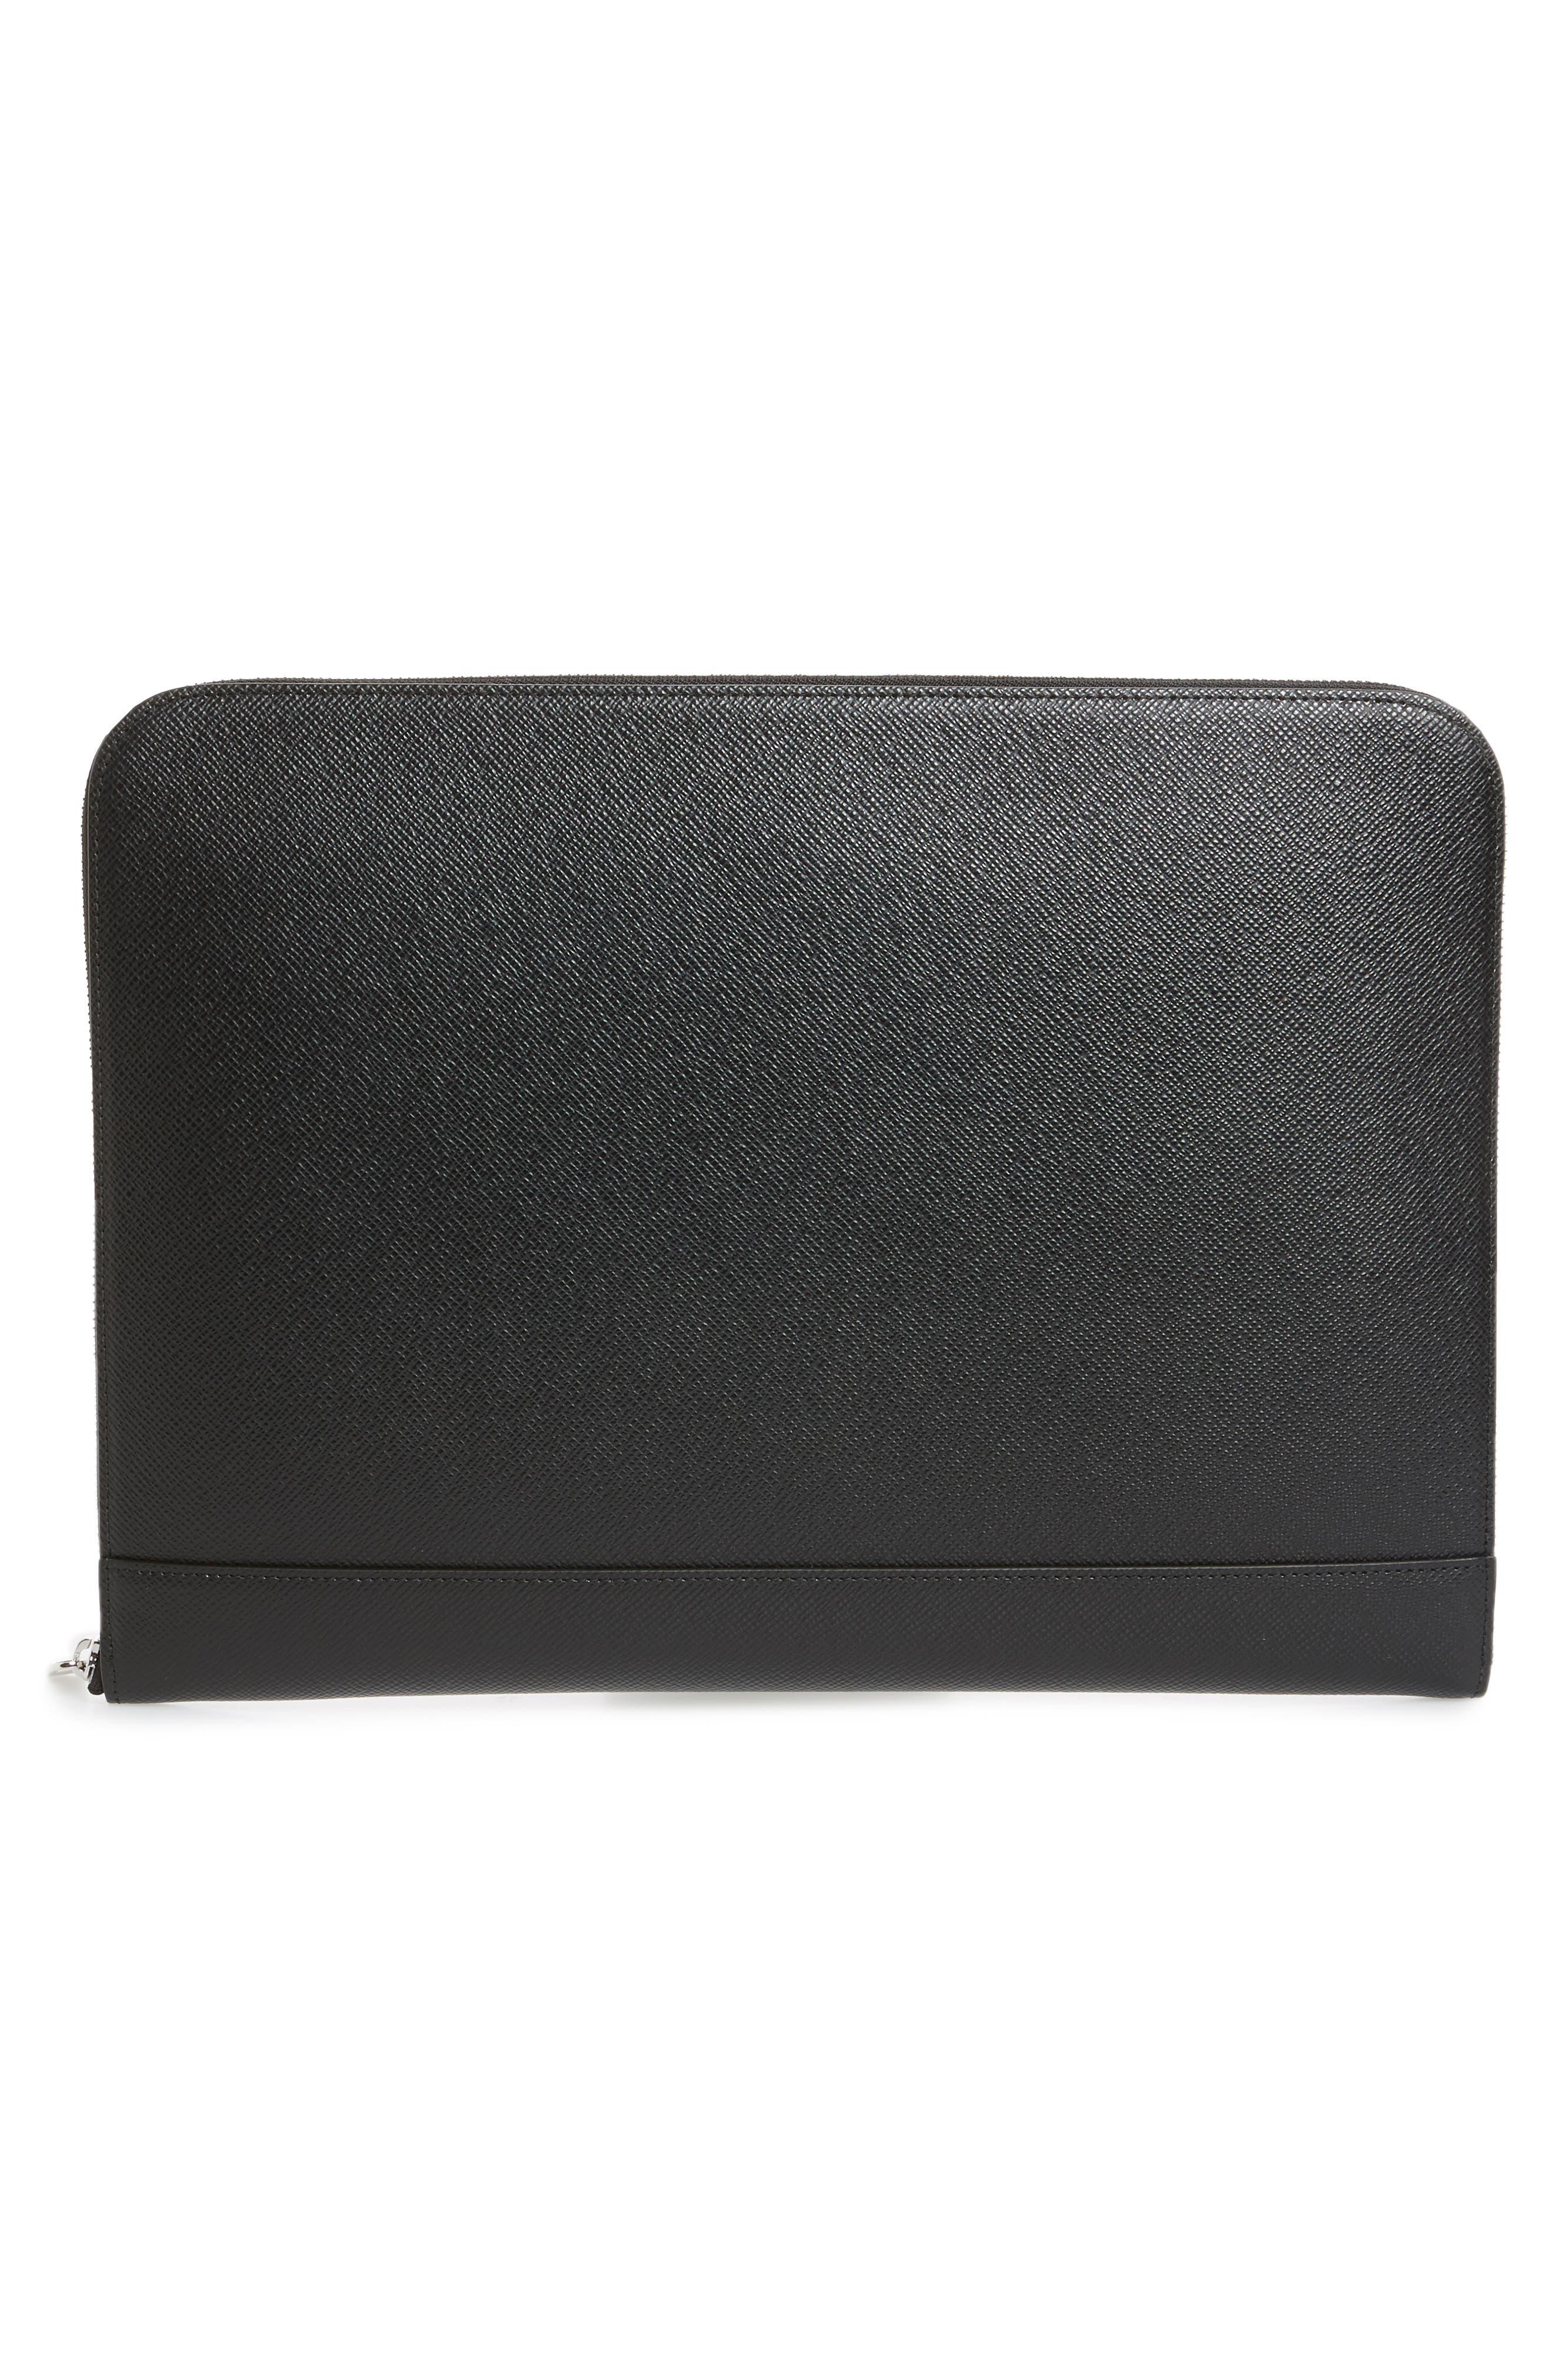 Signature Leather Portfolio,                             Alternate thumbnail 3, color,                             Black